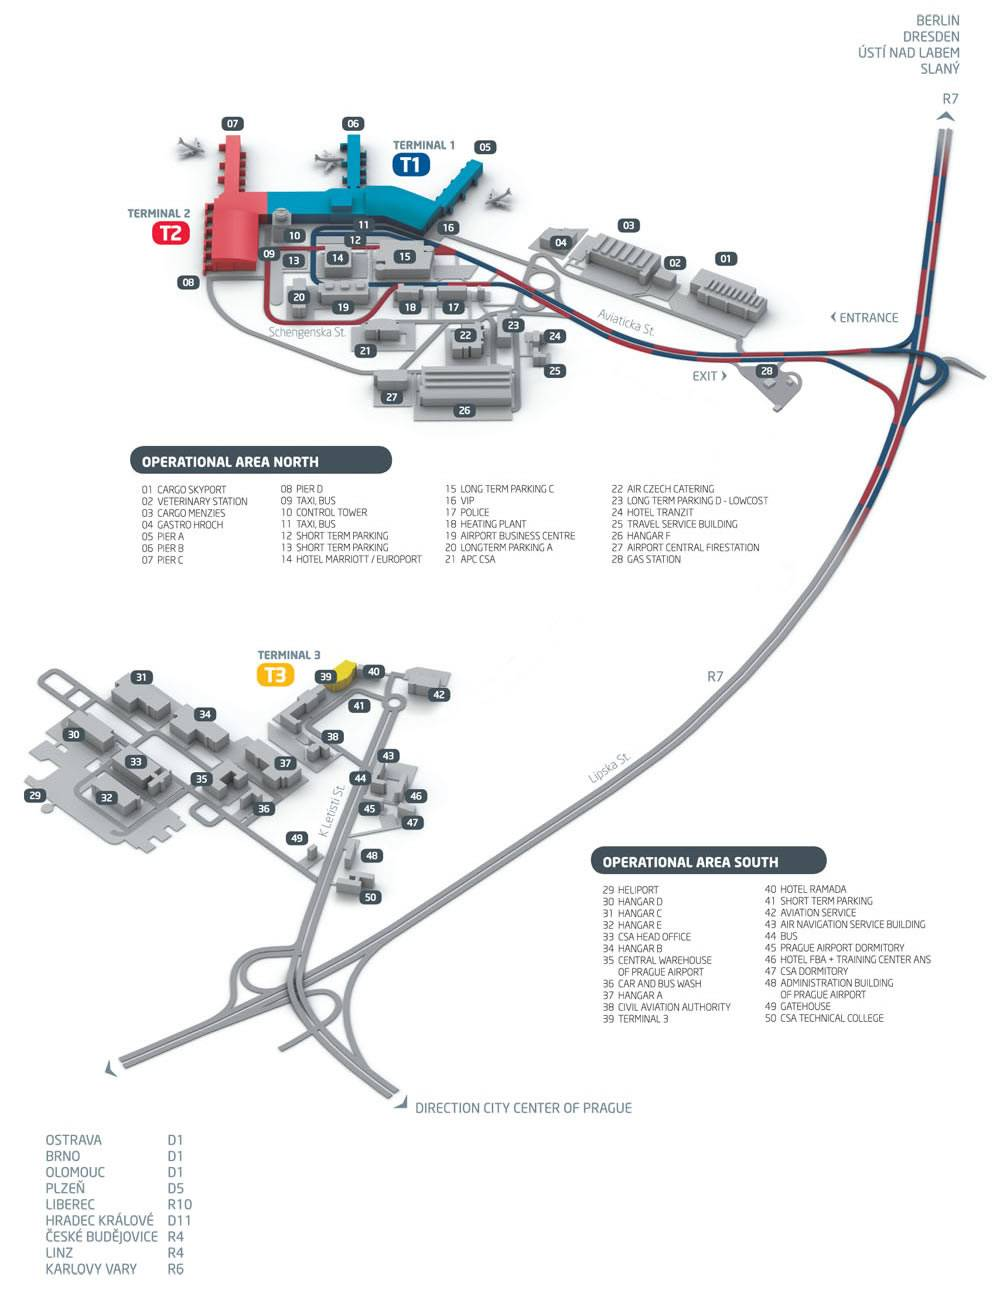 Аэропорт праги рузине (вацлава гавела) - онлайн-табло, описание